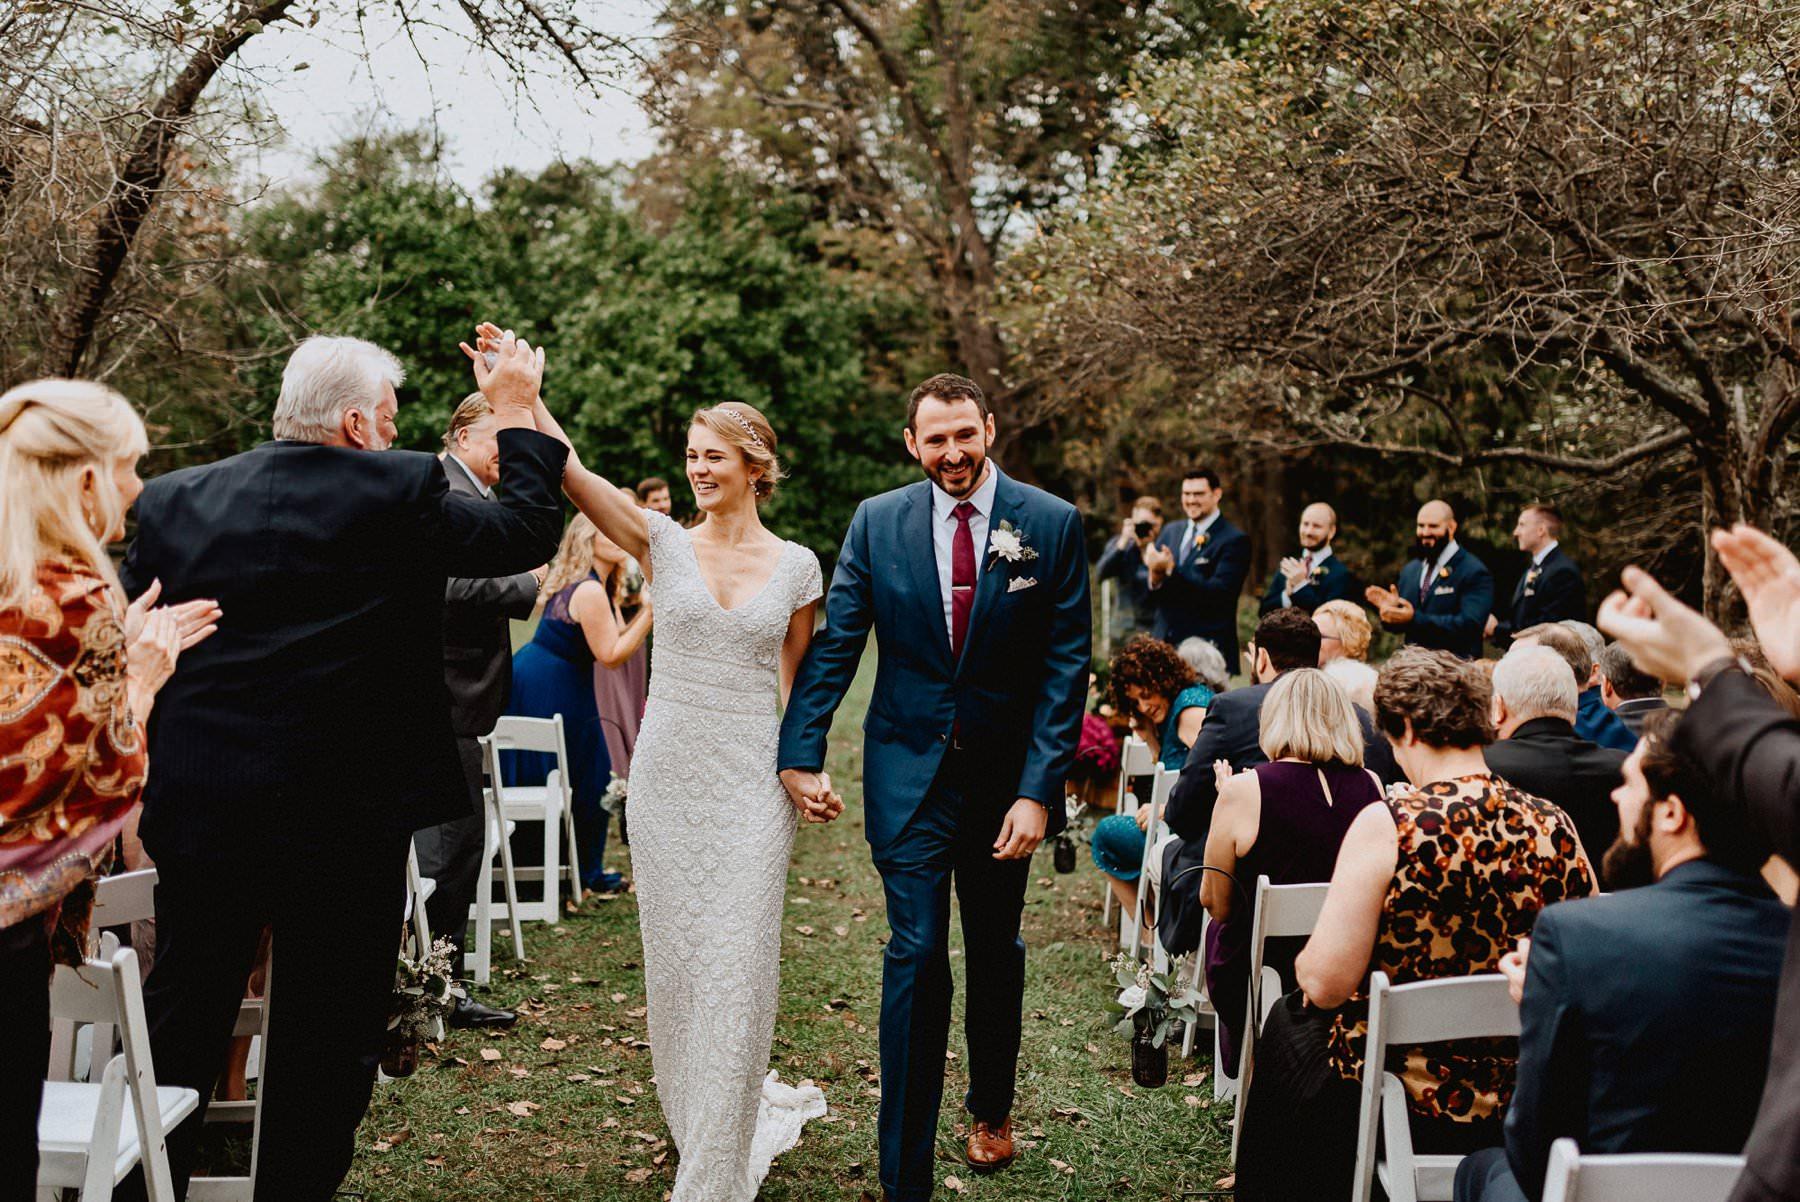 John_James_Audubon_Center_wedding-54.jpg